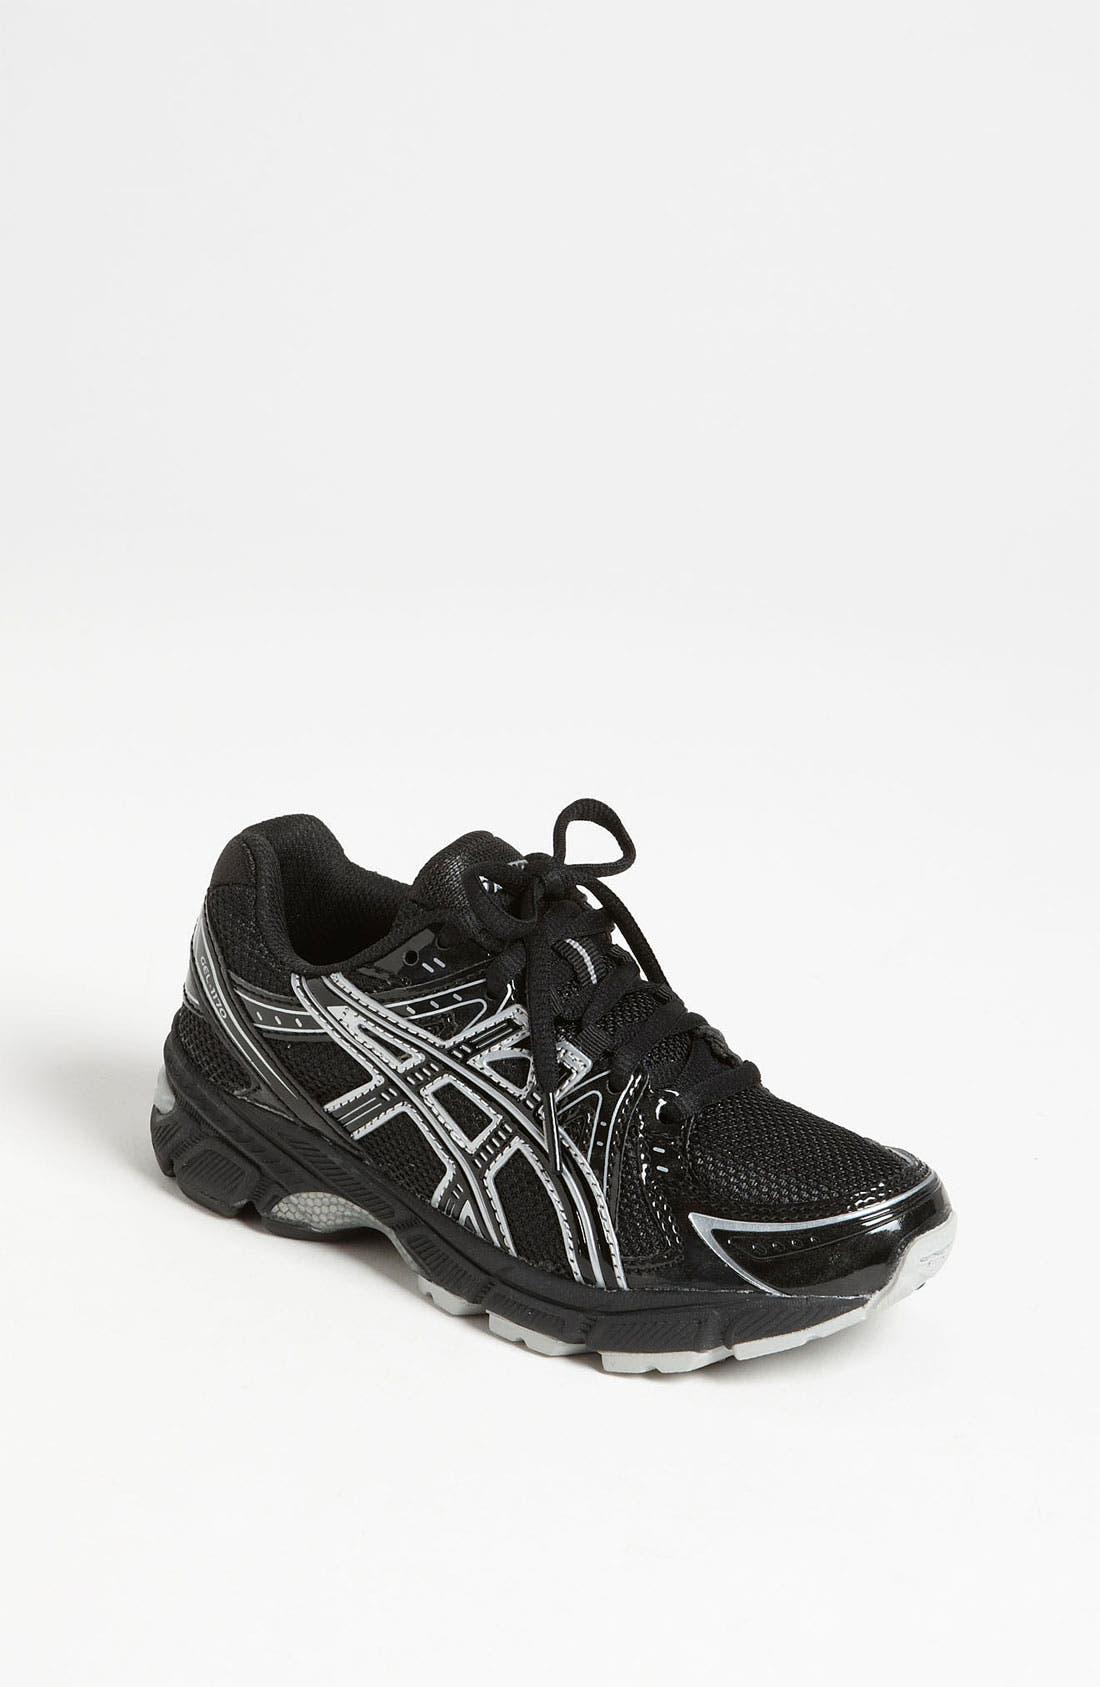 Main Image - ASICS® 'GEL®-1170™' Running Shoe (Little Kid & Big Kid)